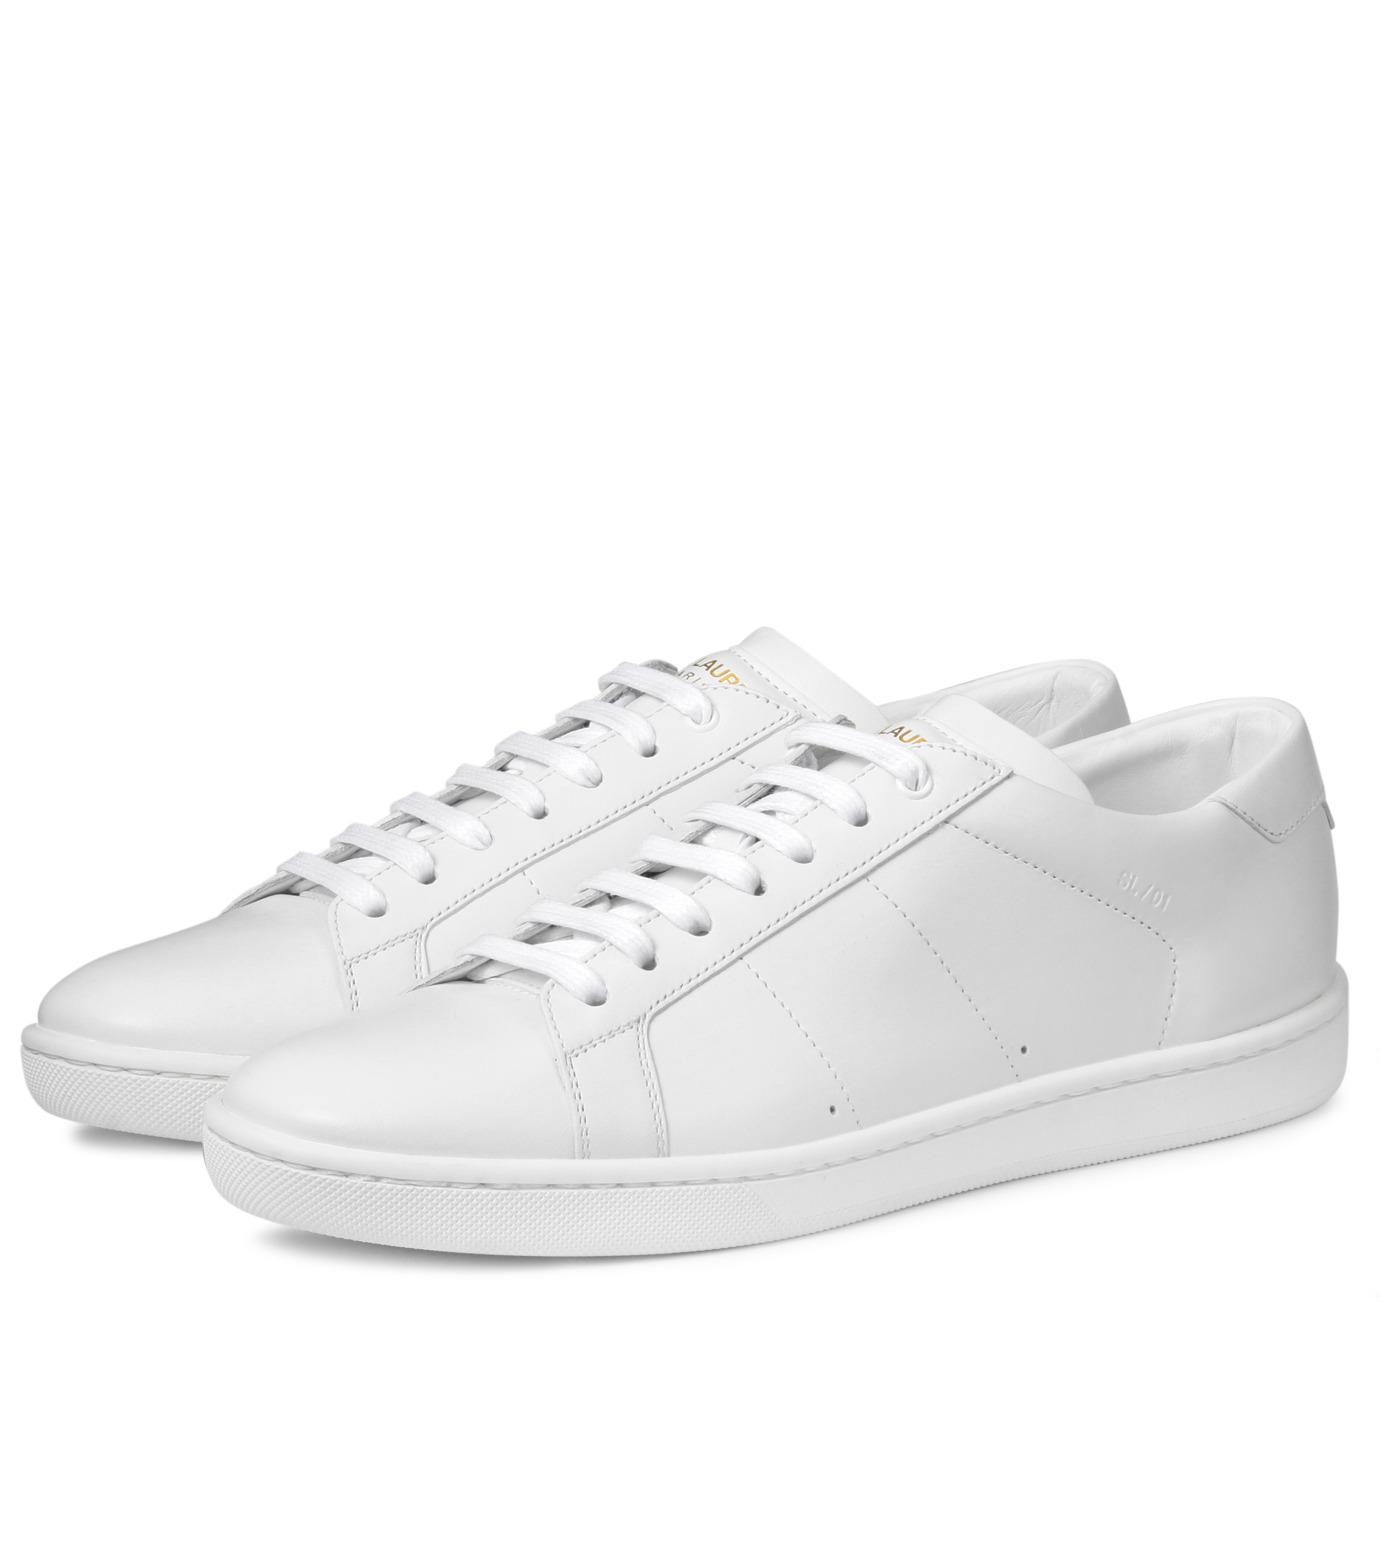 SAINT LAURENT(サンローラン)のLow Top Sneaker-WHITE-336250-AQI00-4 拡大詳細画像3